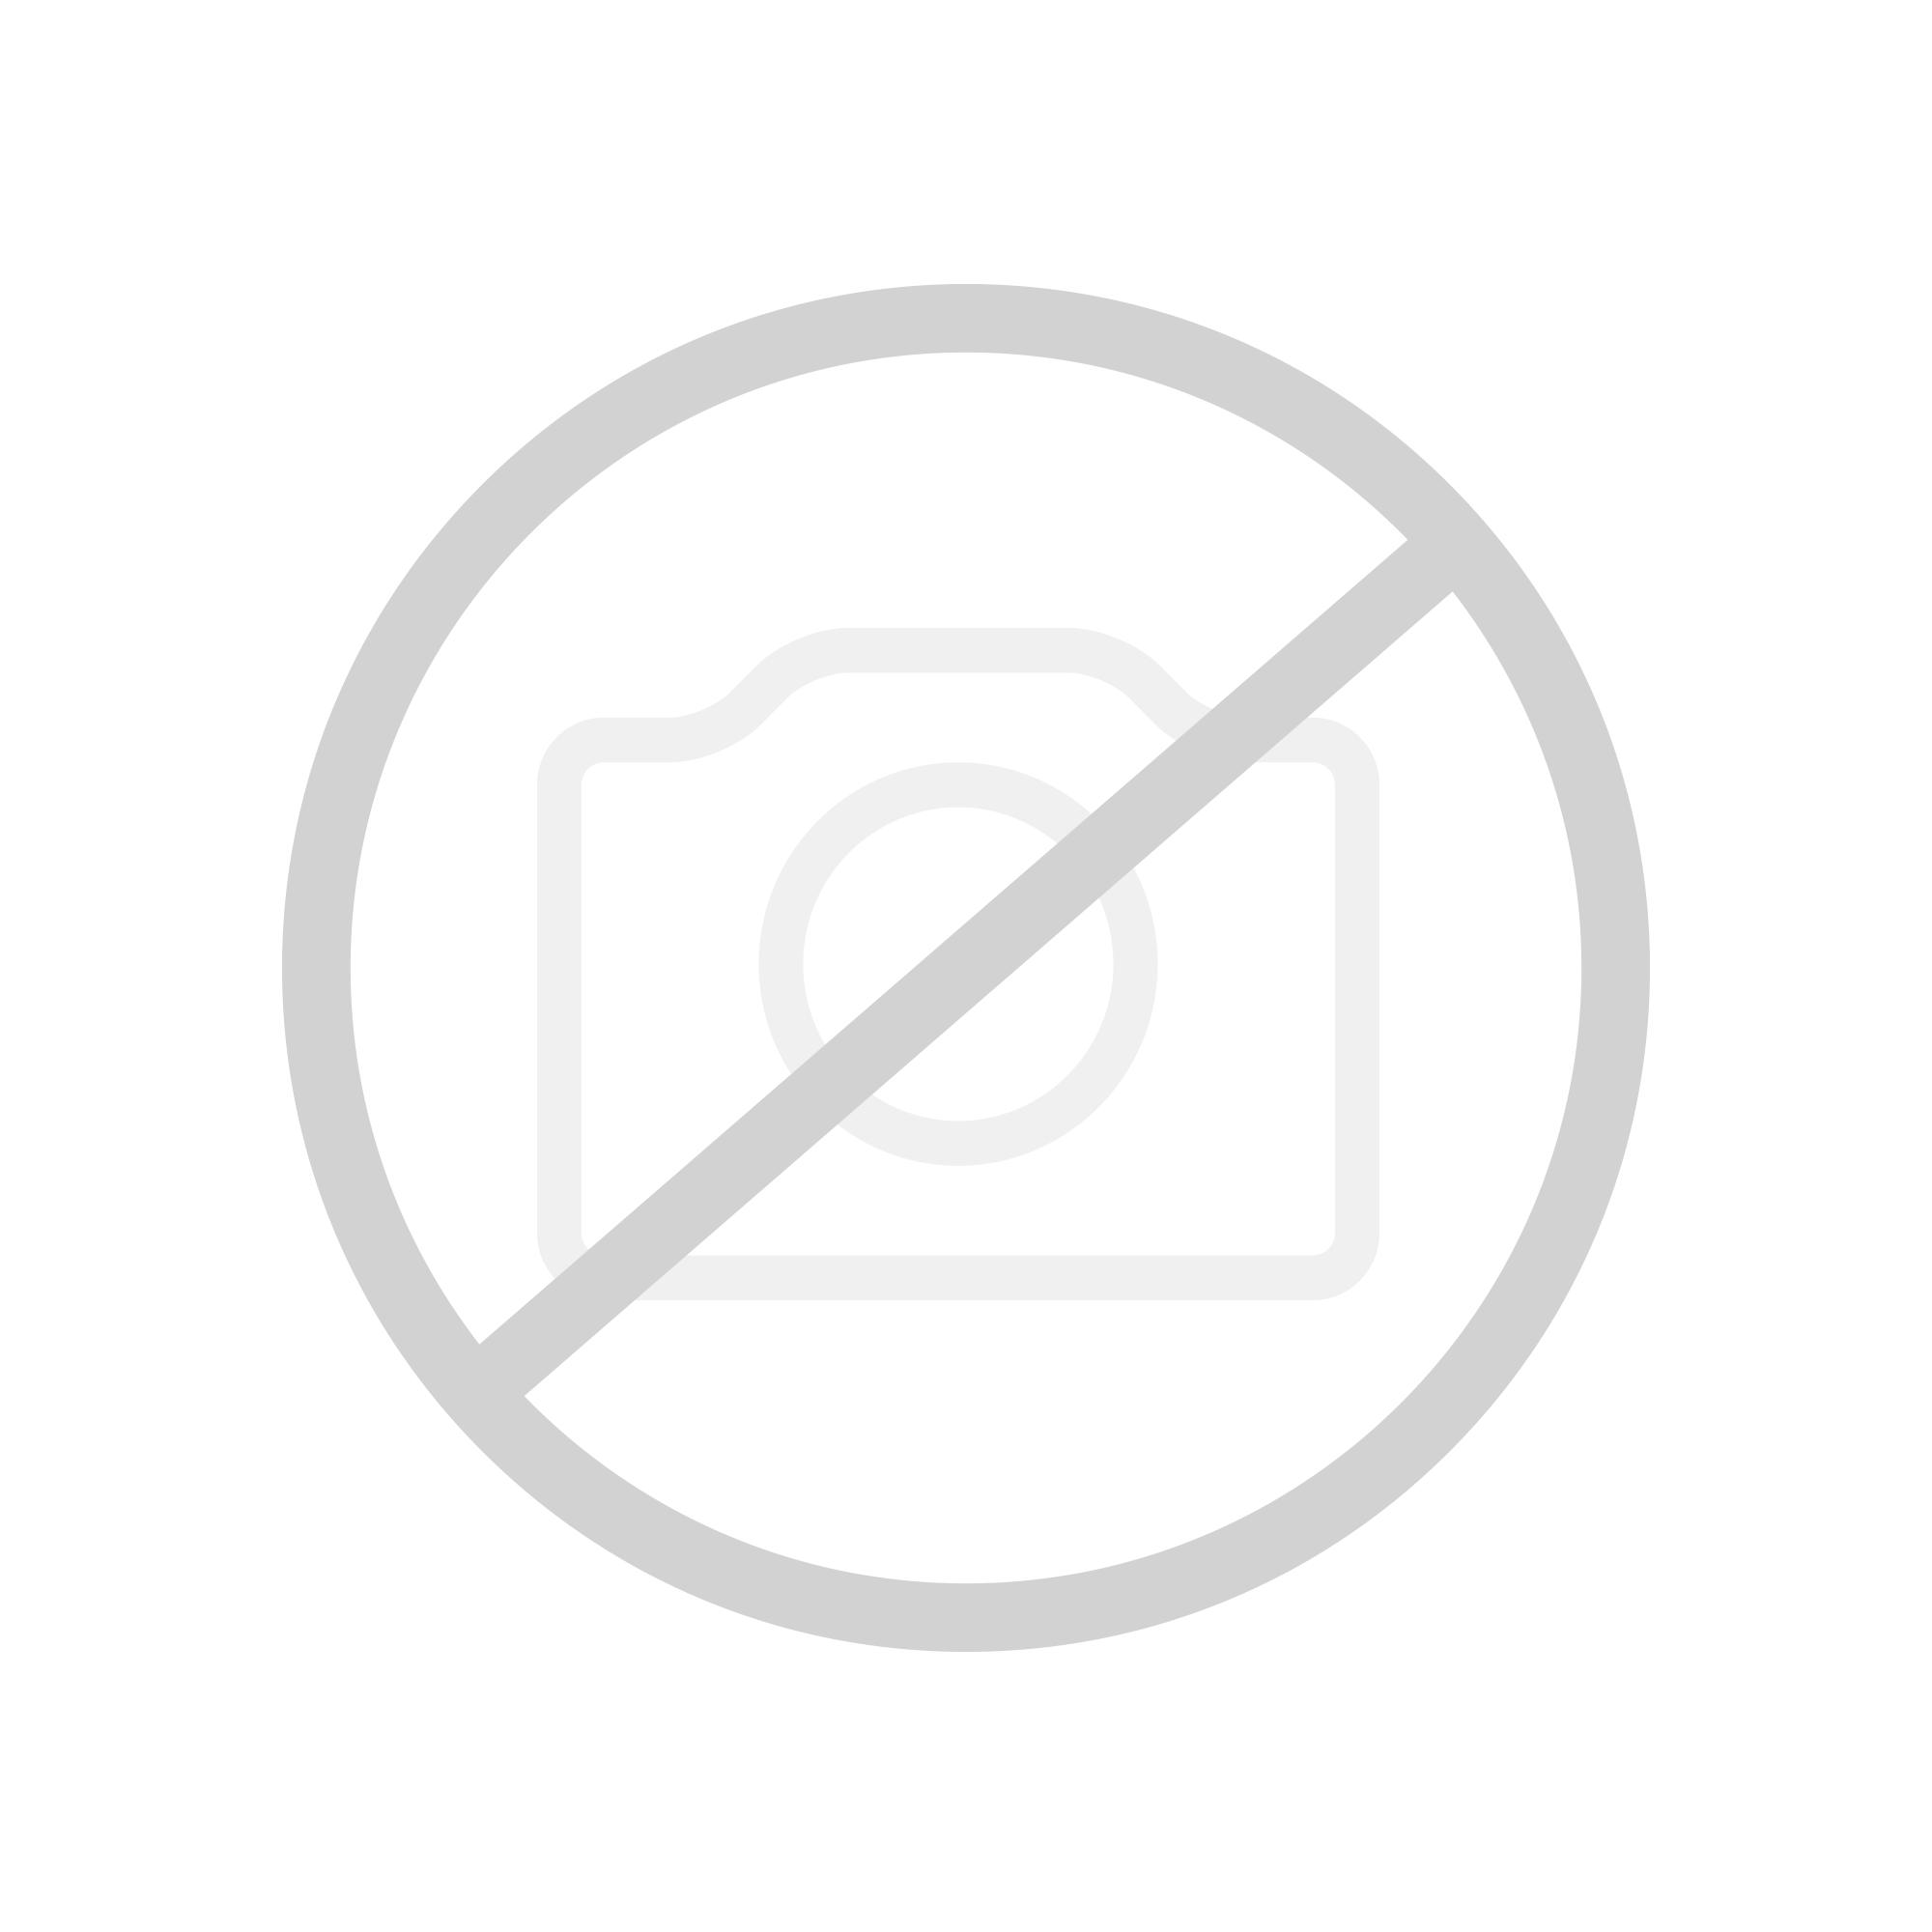 kaldewei centro duo 1 sonderform badewanne rechts pergamon perl effekt 283700013231 reuter. Black Bedroom Furniture Sets. Home Design Ideas